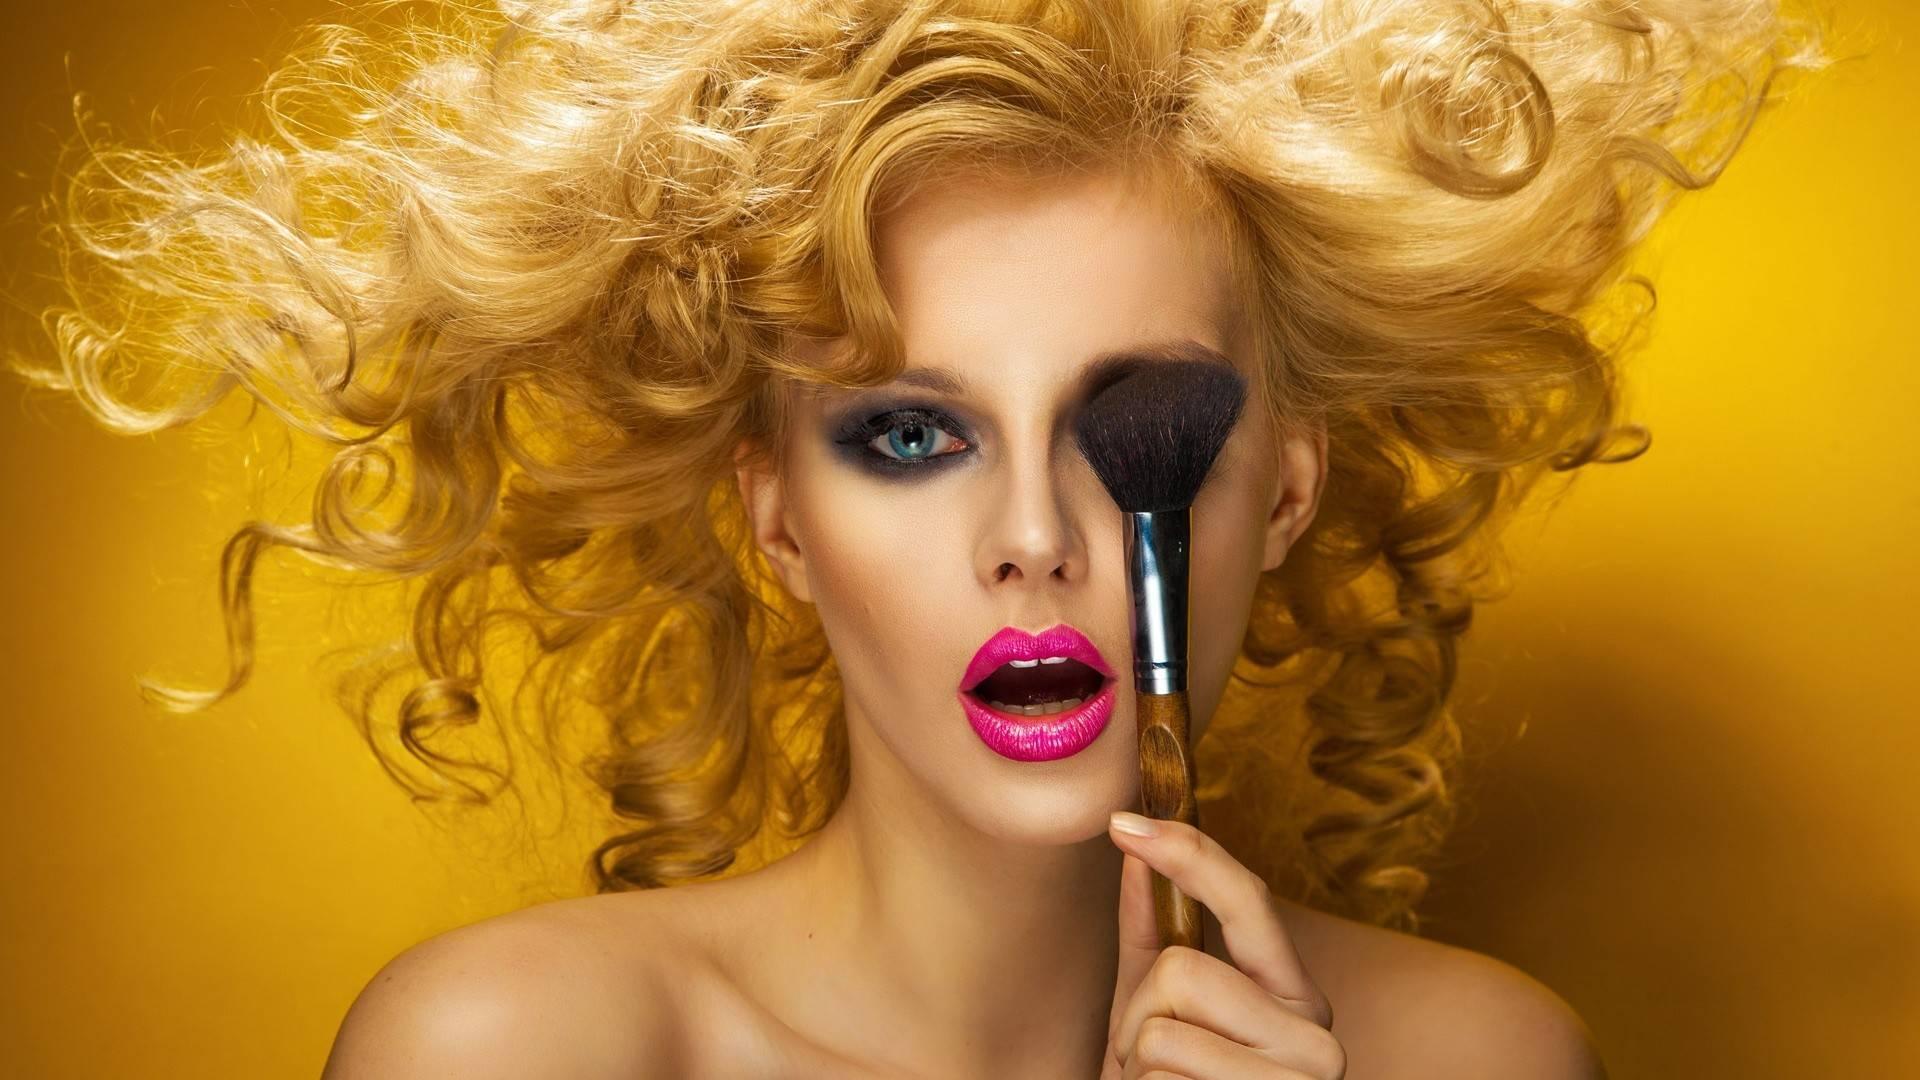 Makeup Wallpaper